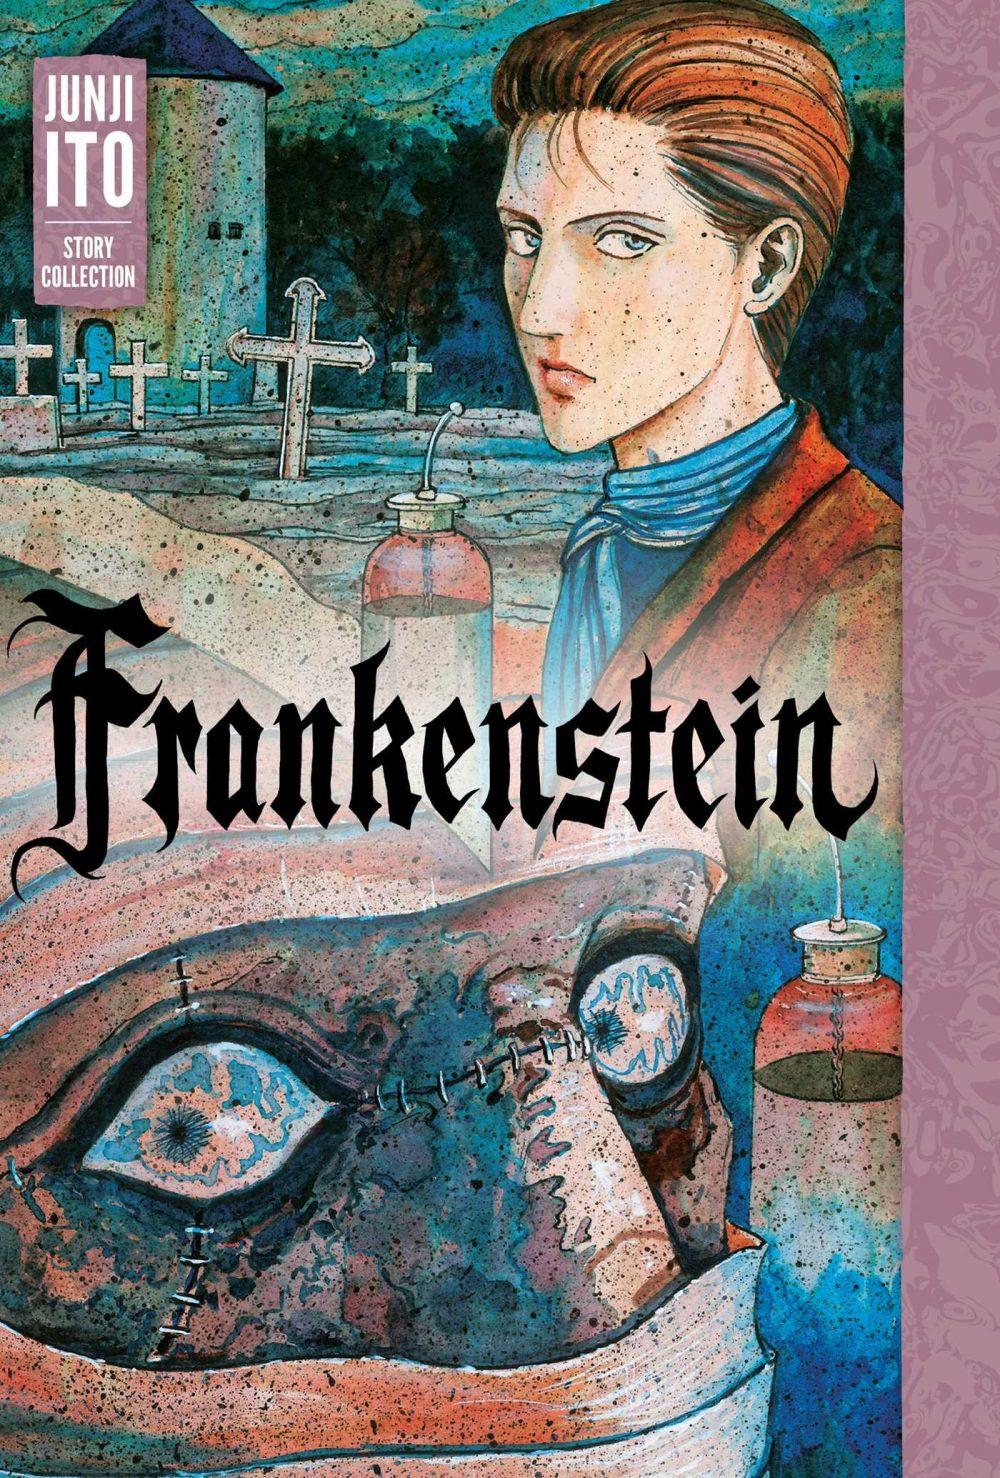 Frankenstein: Junji Ito Story Collection, copertina